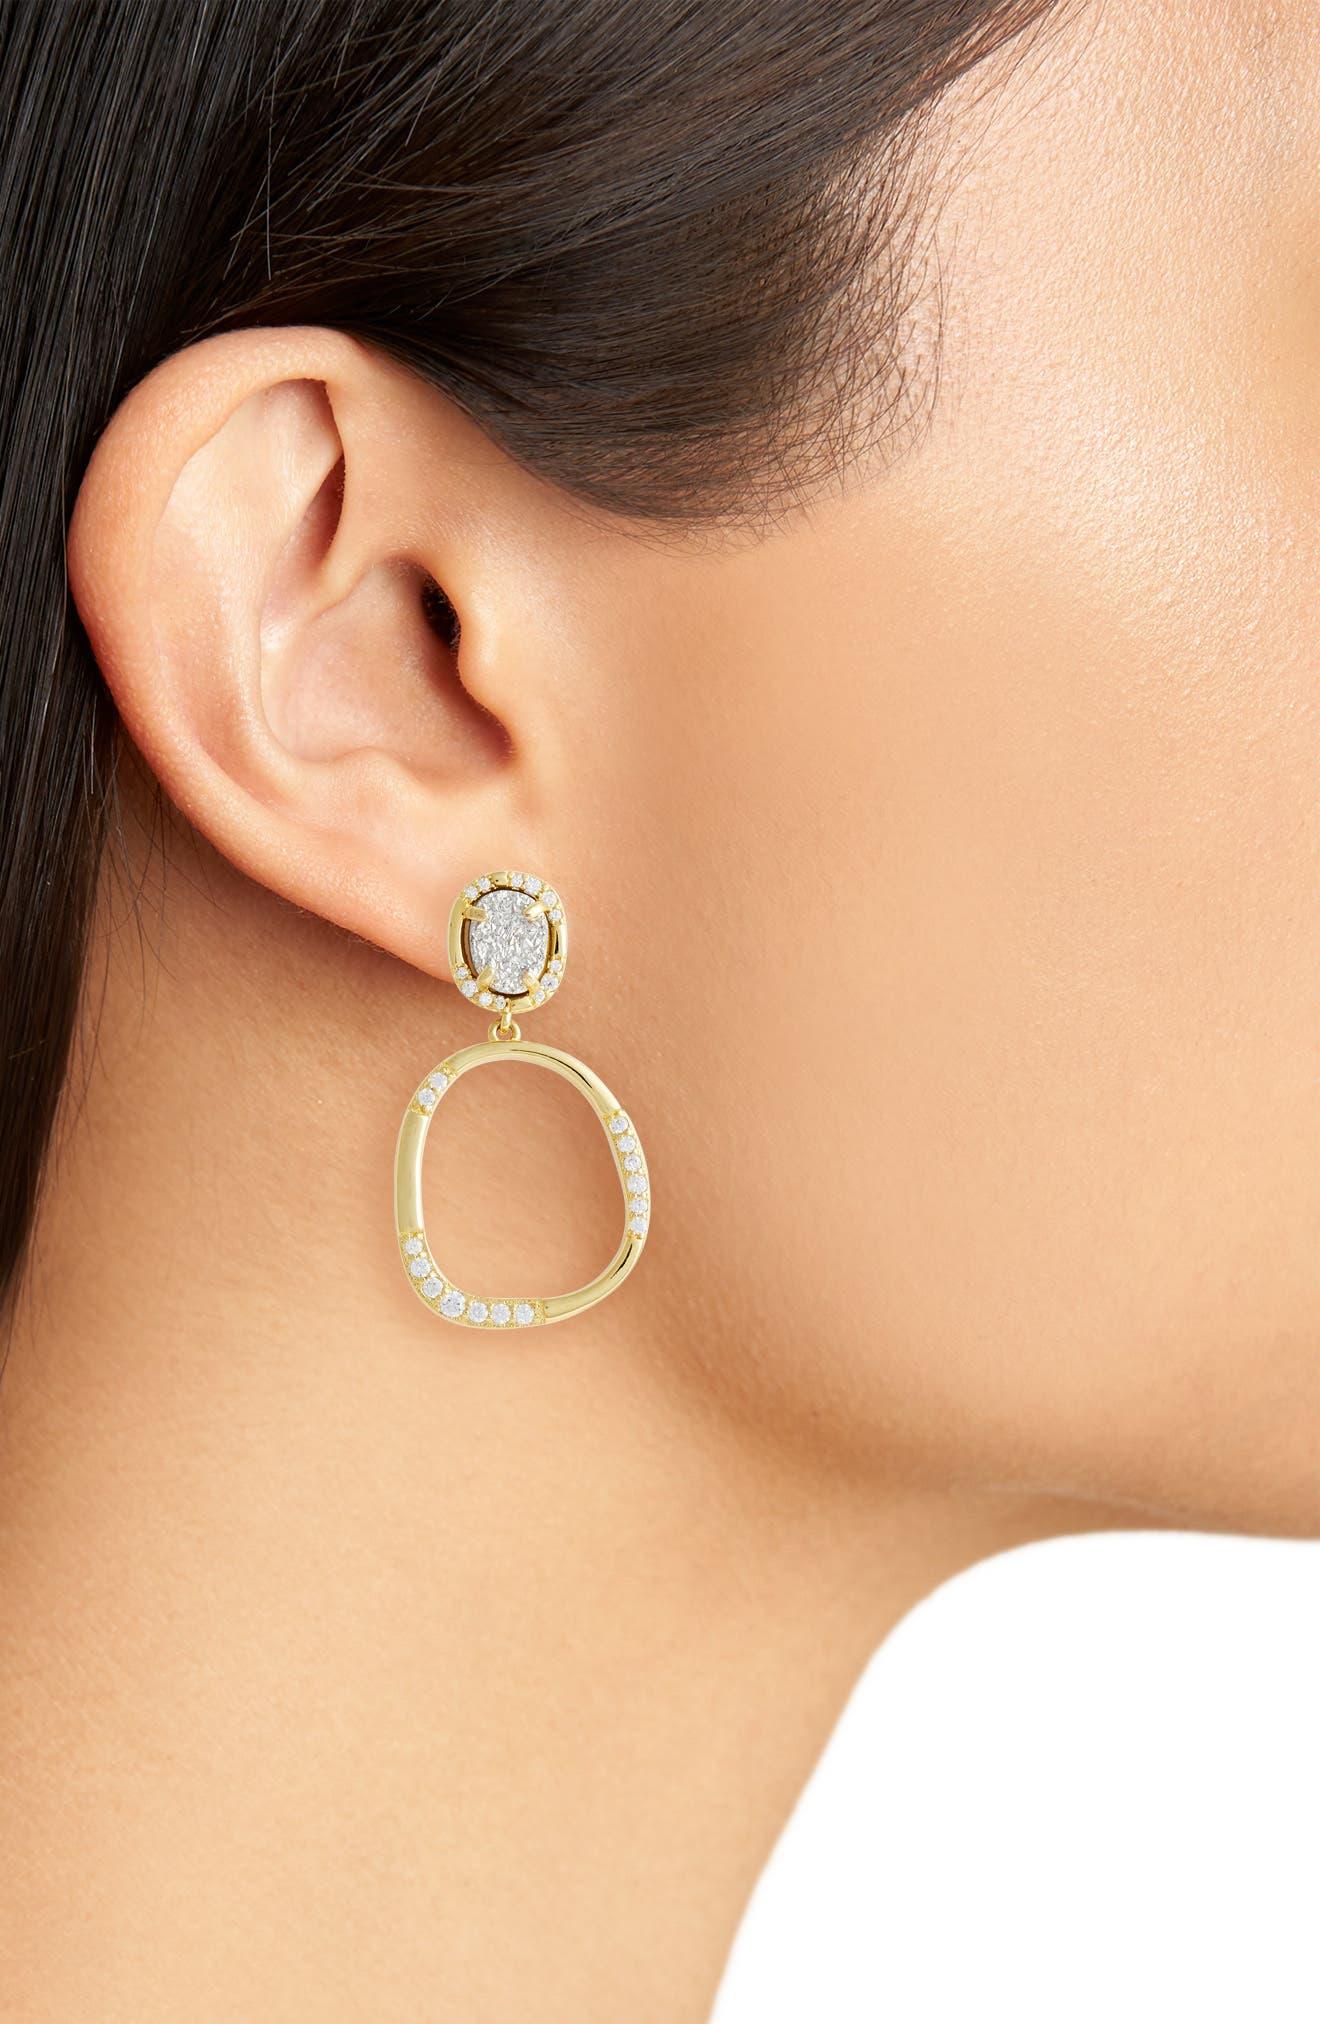 Luna Drop Earrings,                             Alternate thumbnail 2, color,                             Grey Druzy/ Gold